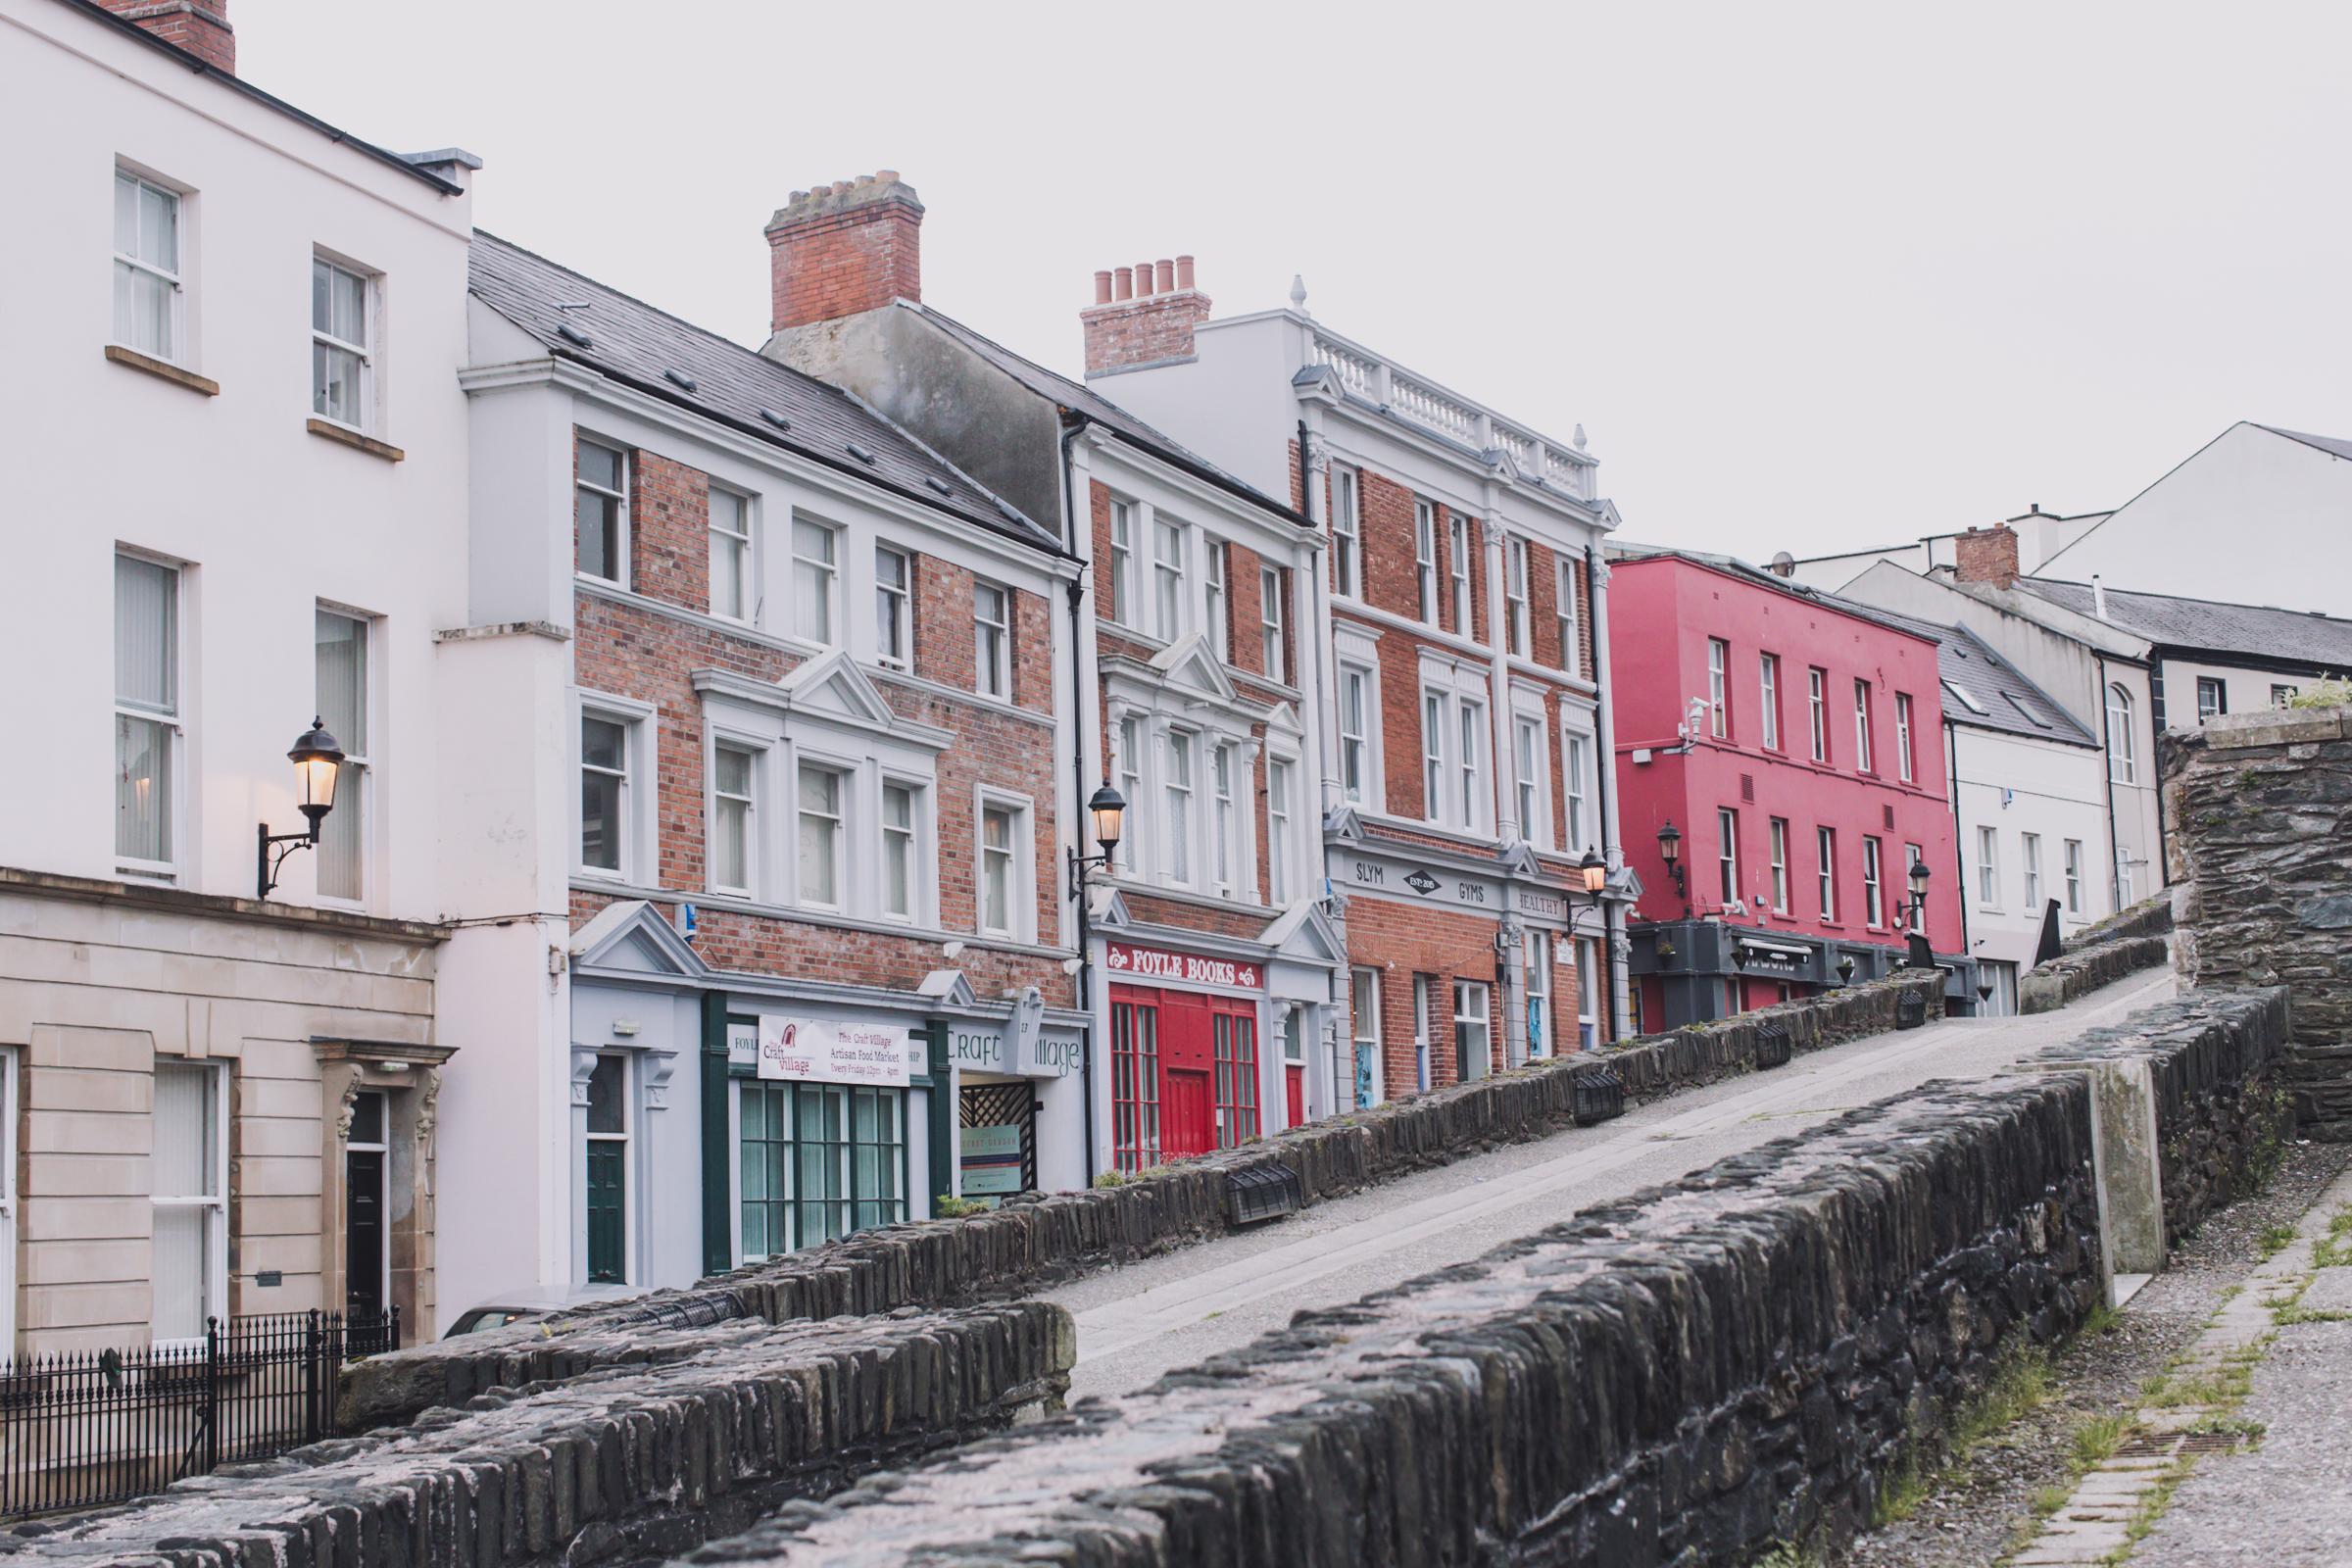 20150616-073-Ireland_Travel_Editorial.jpg